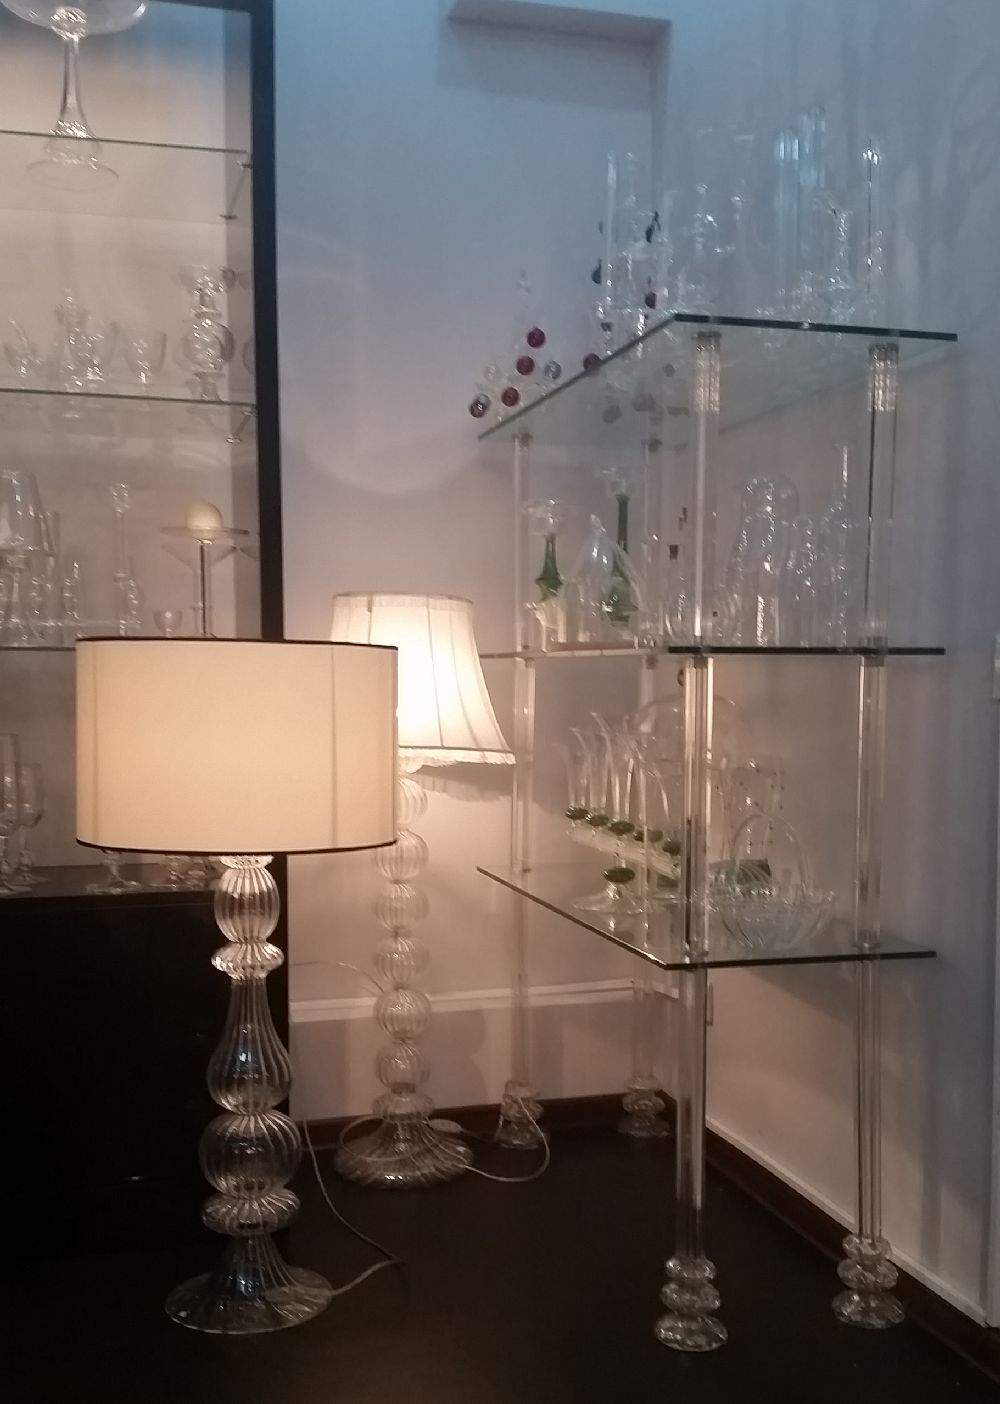 adelaparvu.com despre atelierul de sticlarie Gabriela Seres (53)